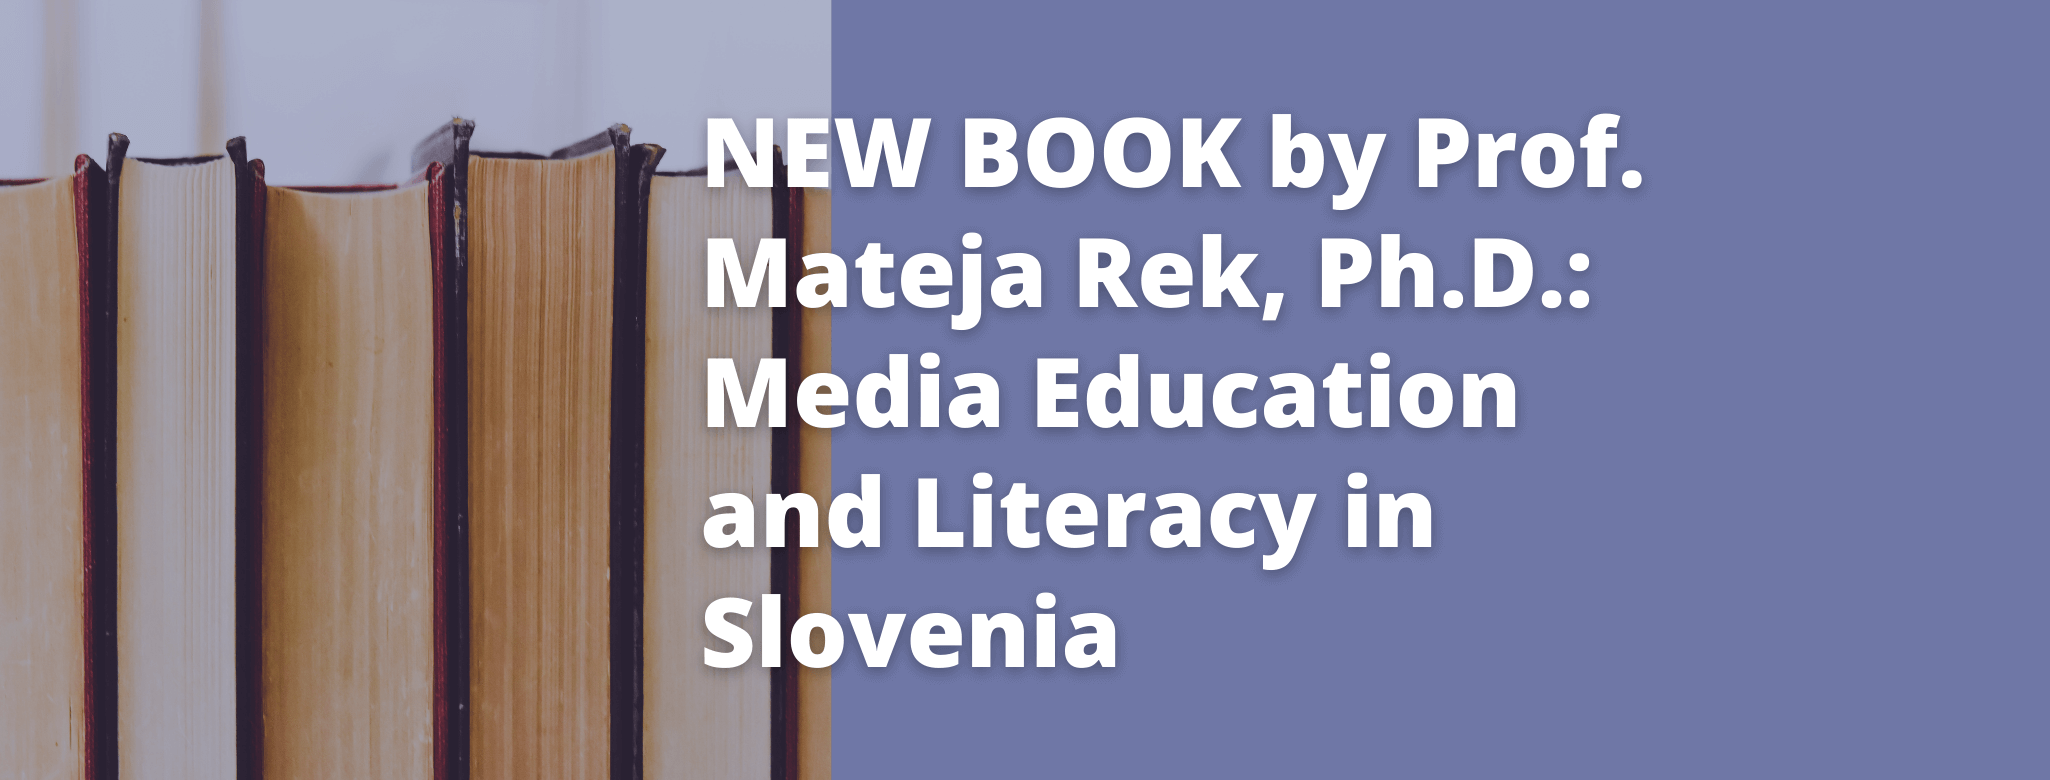 New book by Prof. Mateja Rek, Ph.D.